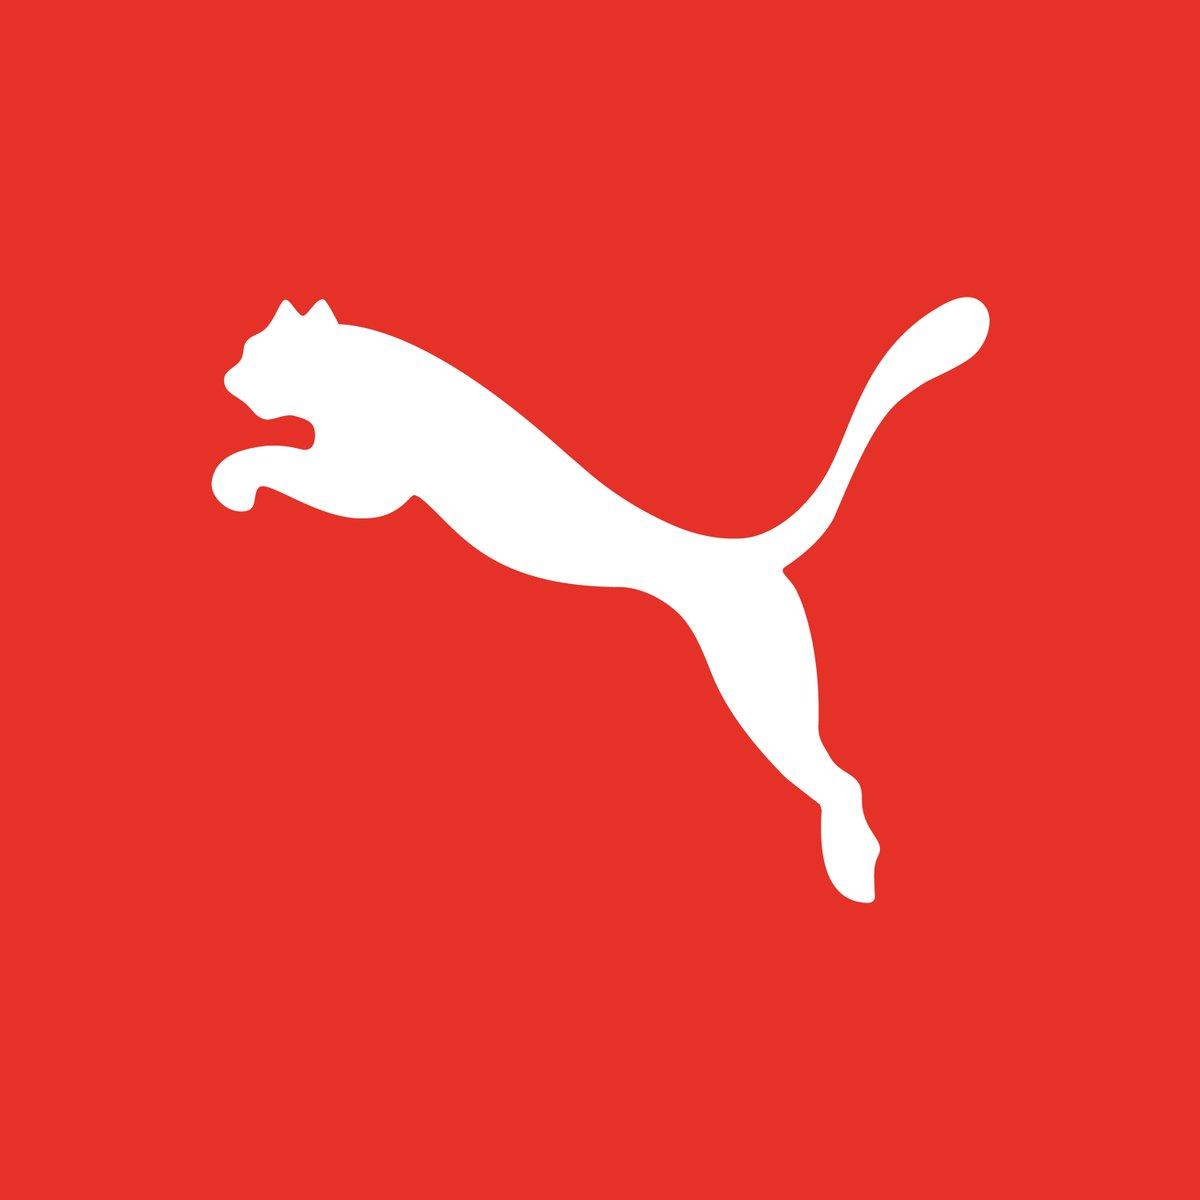 Analisis logo puma - Puma logo pictures ...